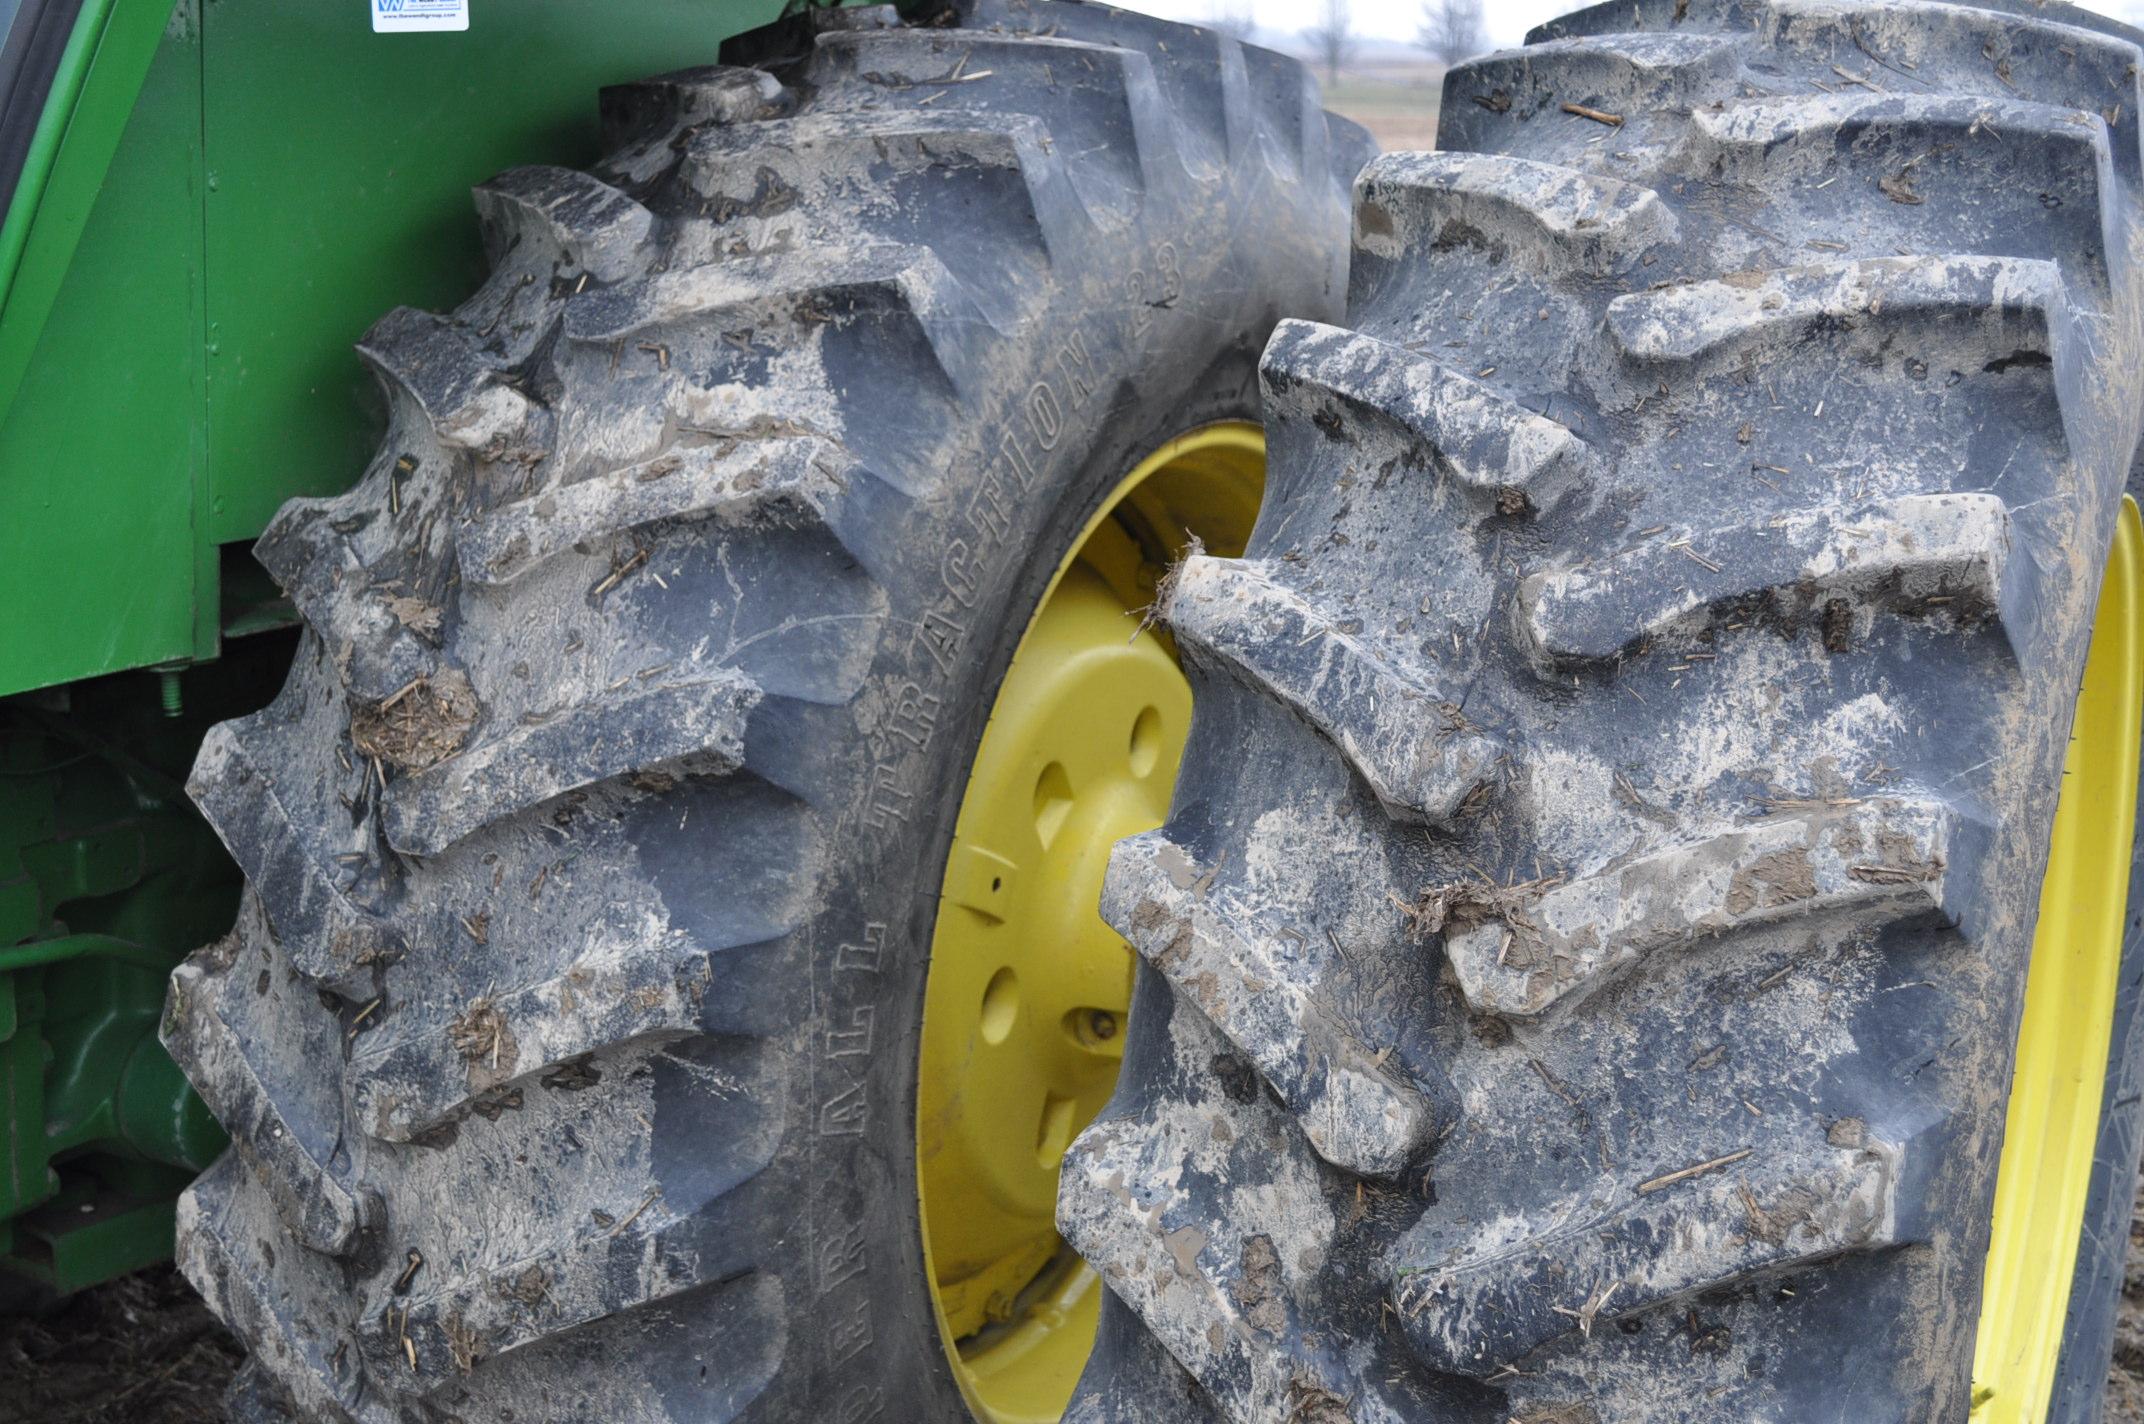 John Deere 4630 tractor, diesel, 20.8-38 hub duals, 14L-16 front, CHA, Quad range, 2 hyd remotes, - Image 6 of 22